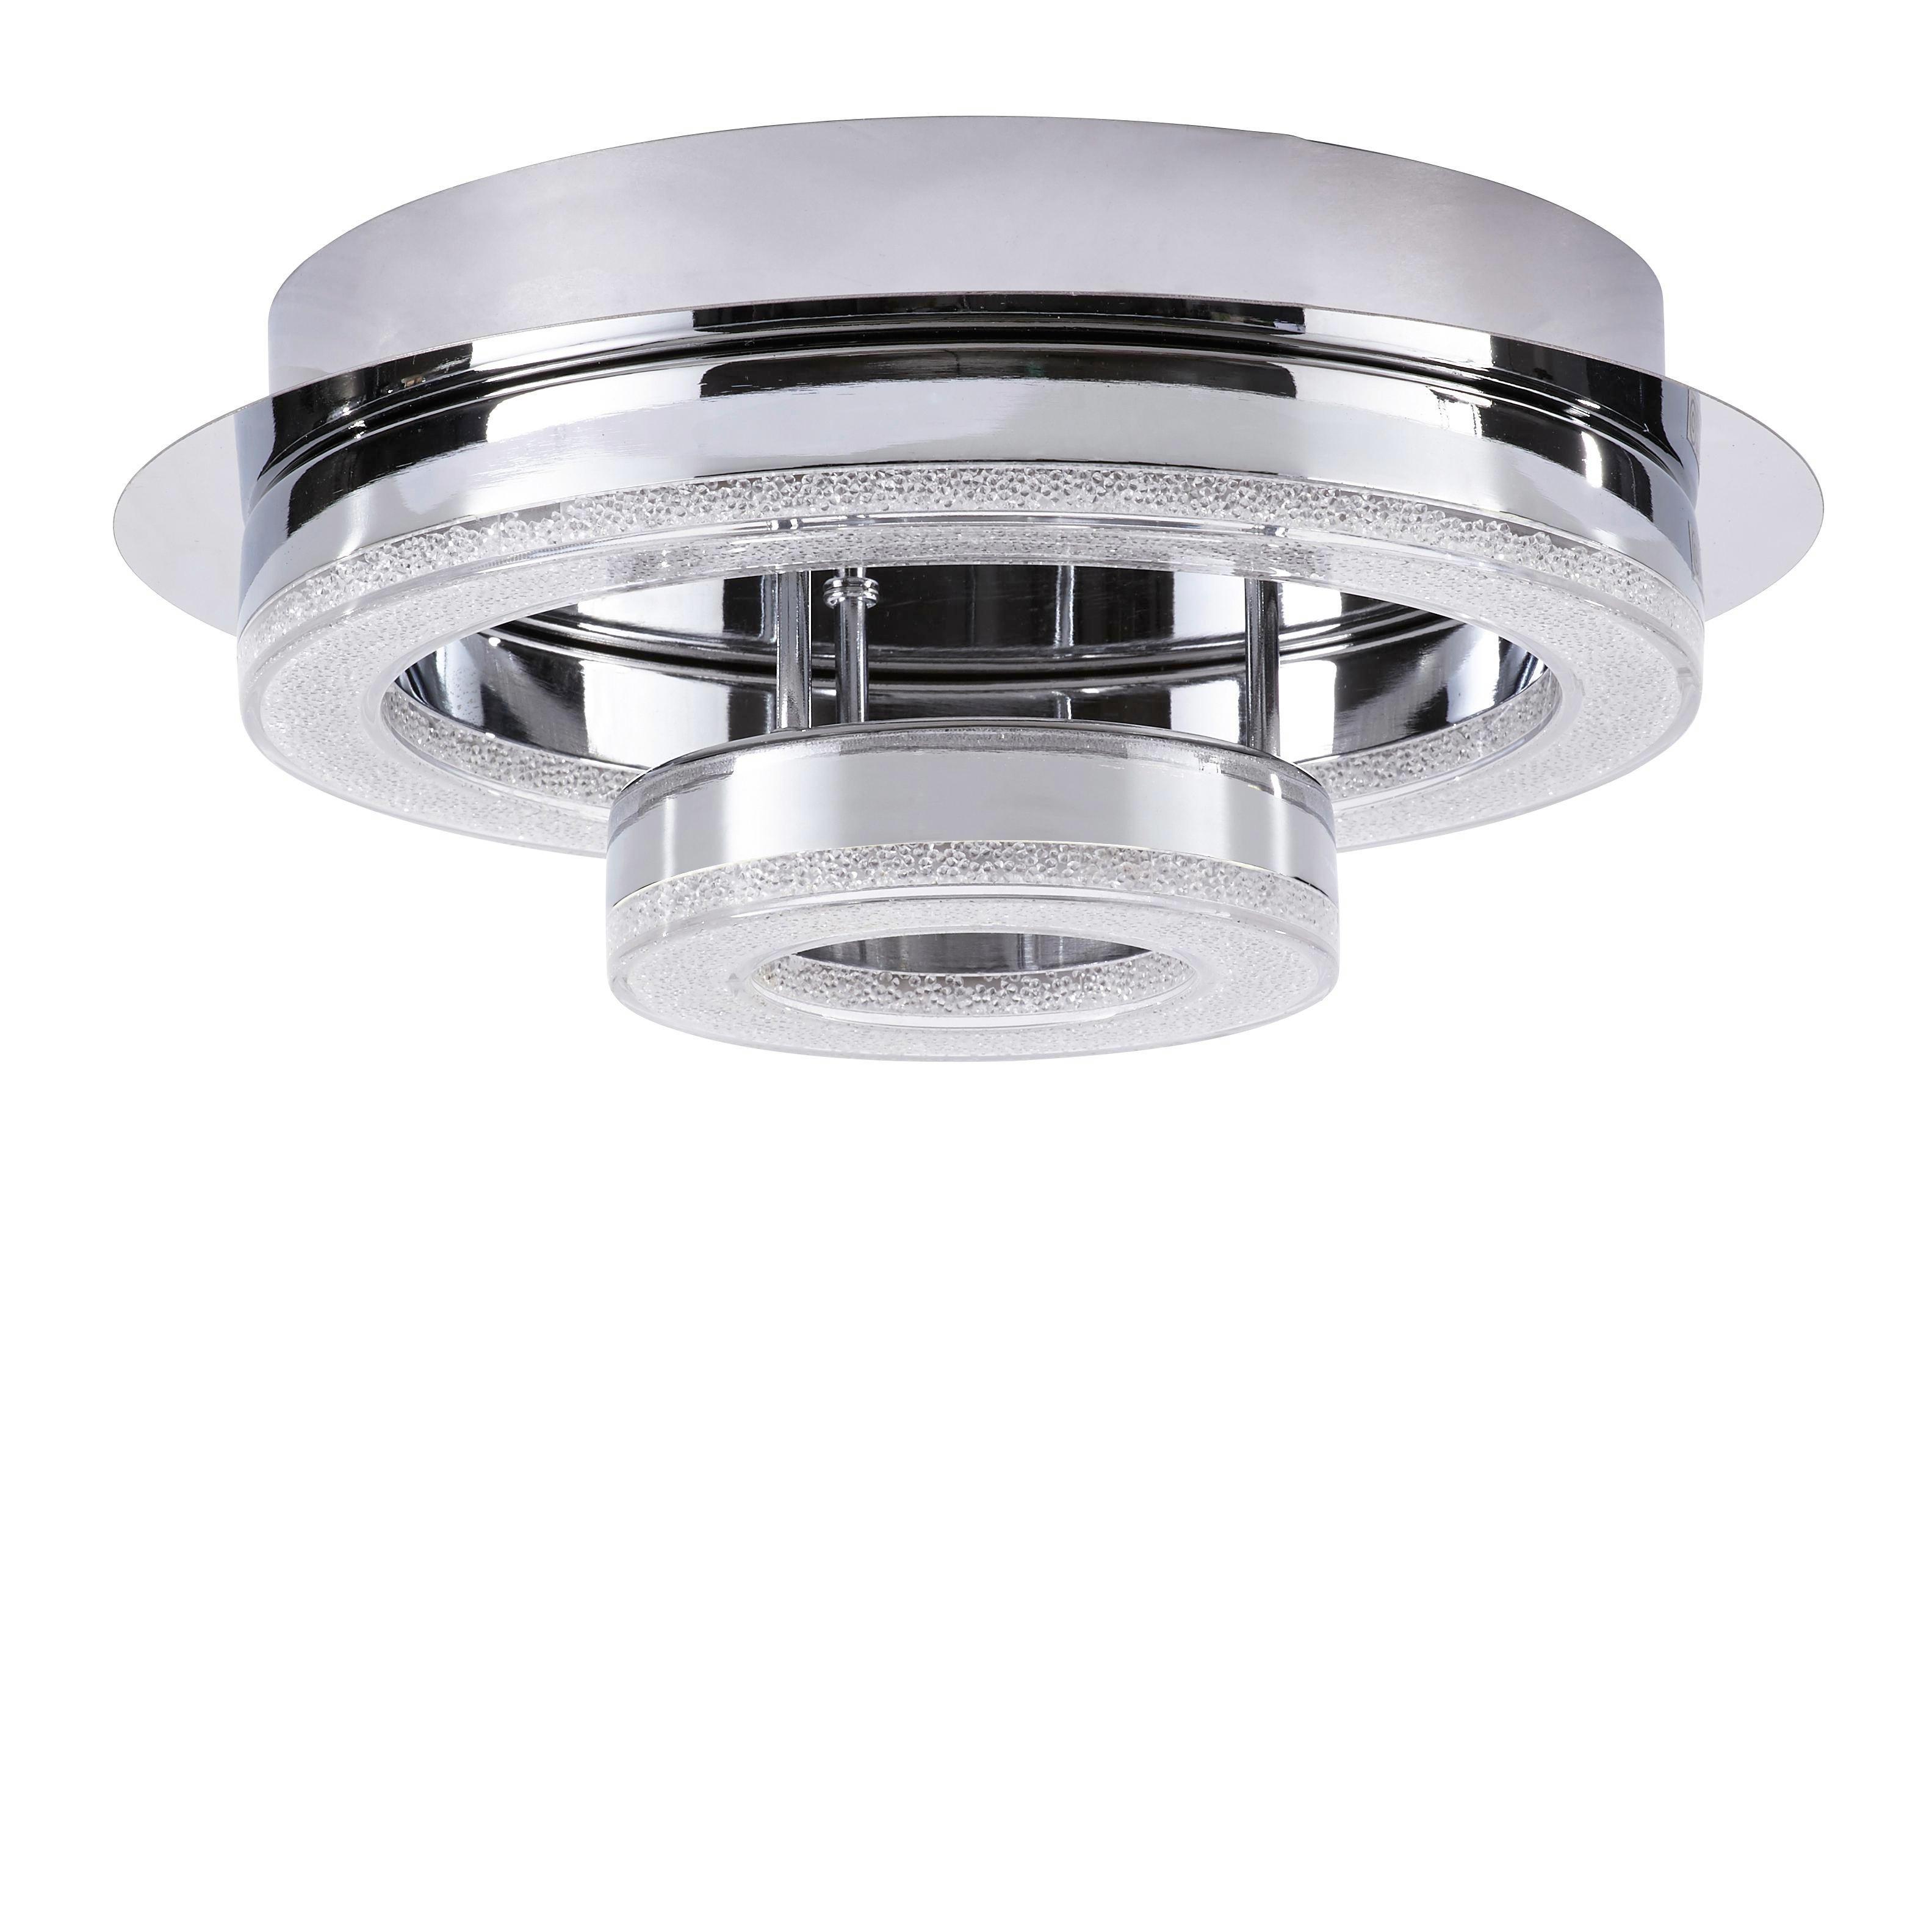 LED-DECKENLEUCHTE - Chromfarben, Design, Kunststoff/Metall (28/11,2cm)